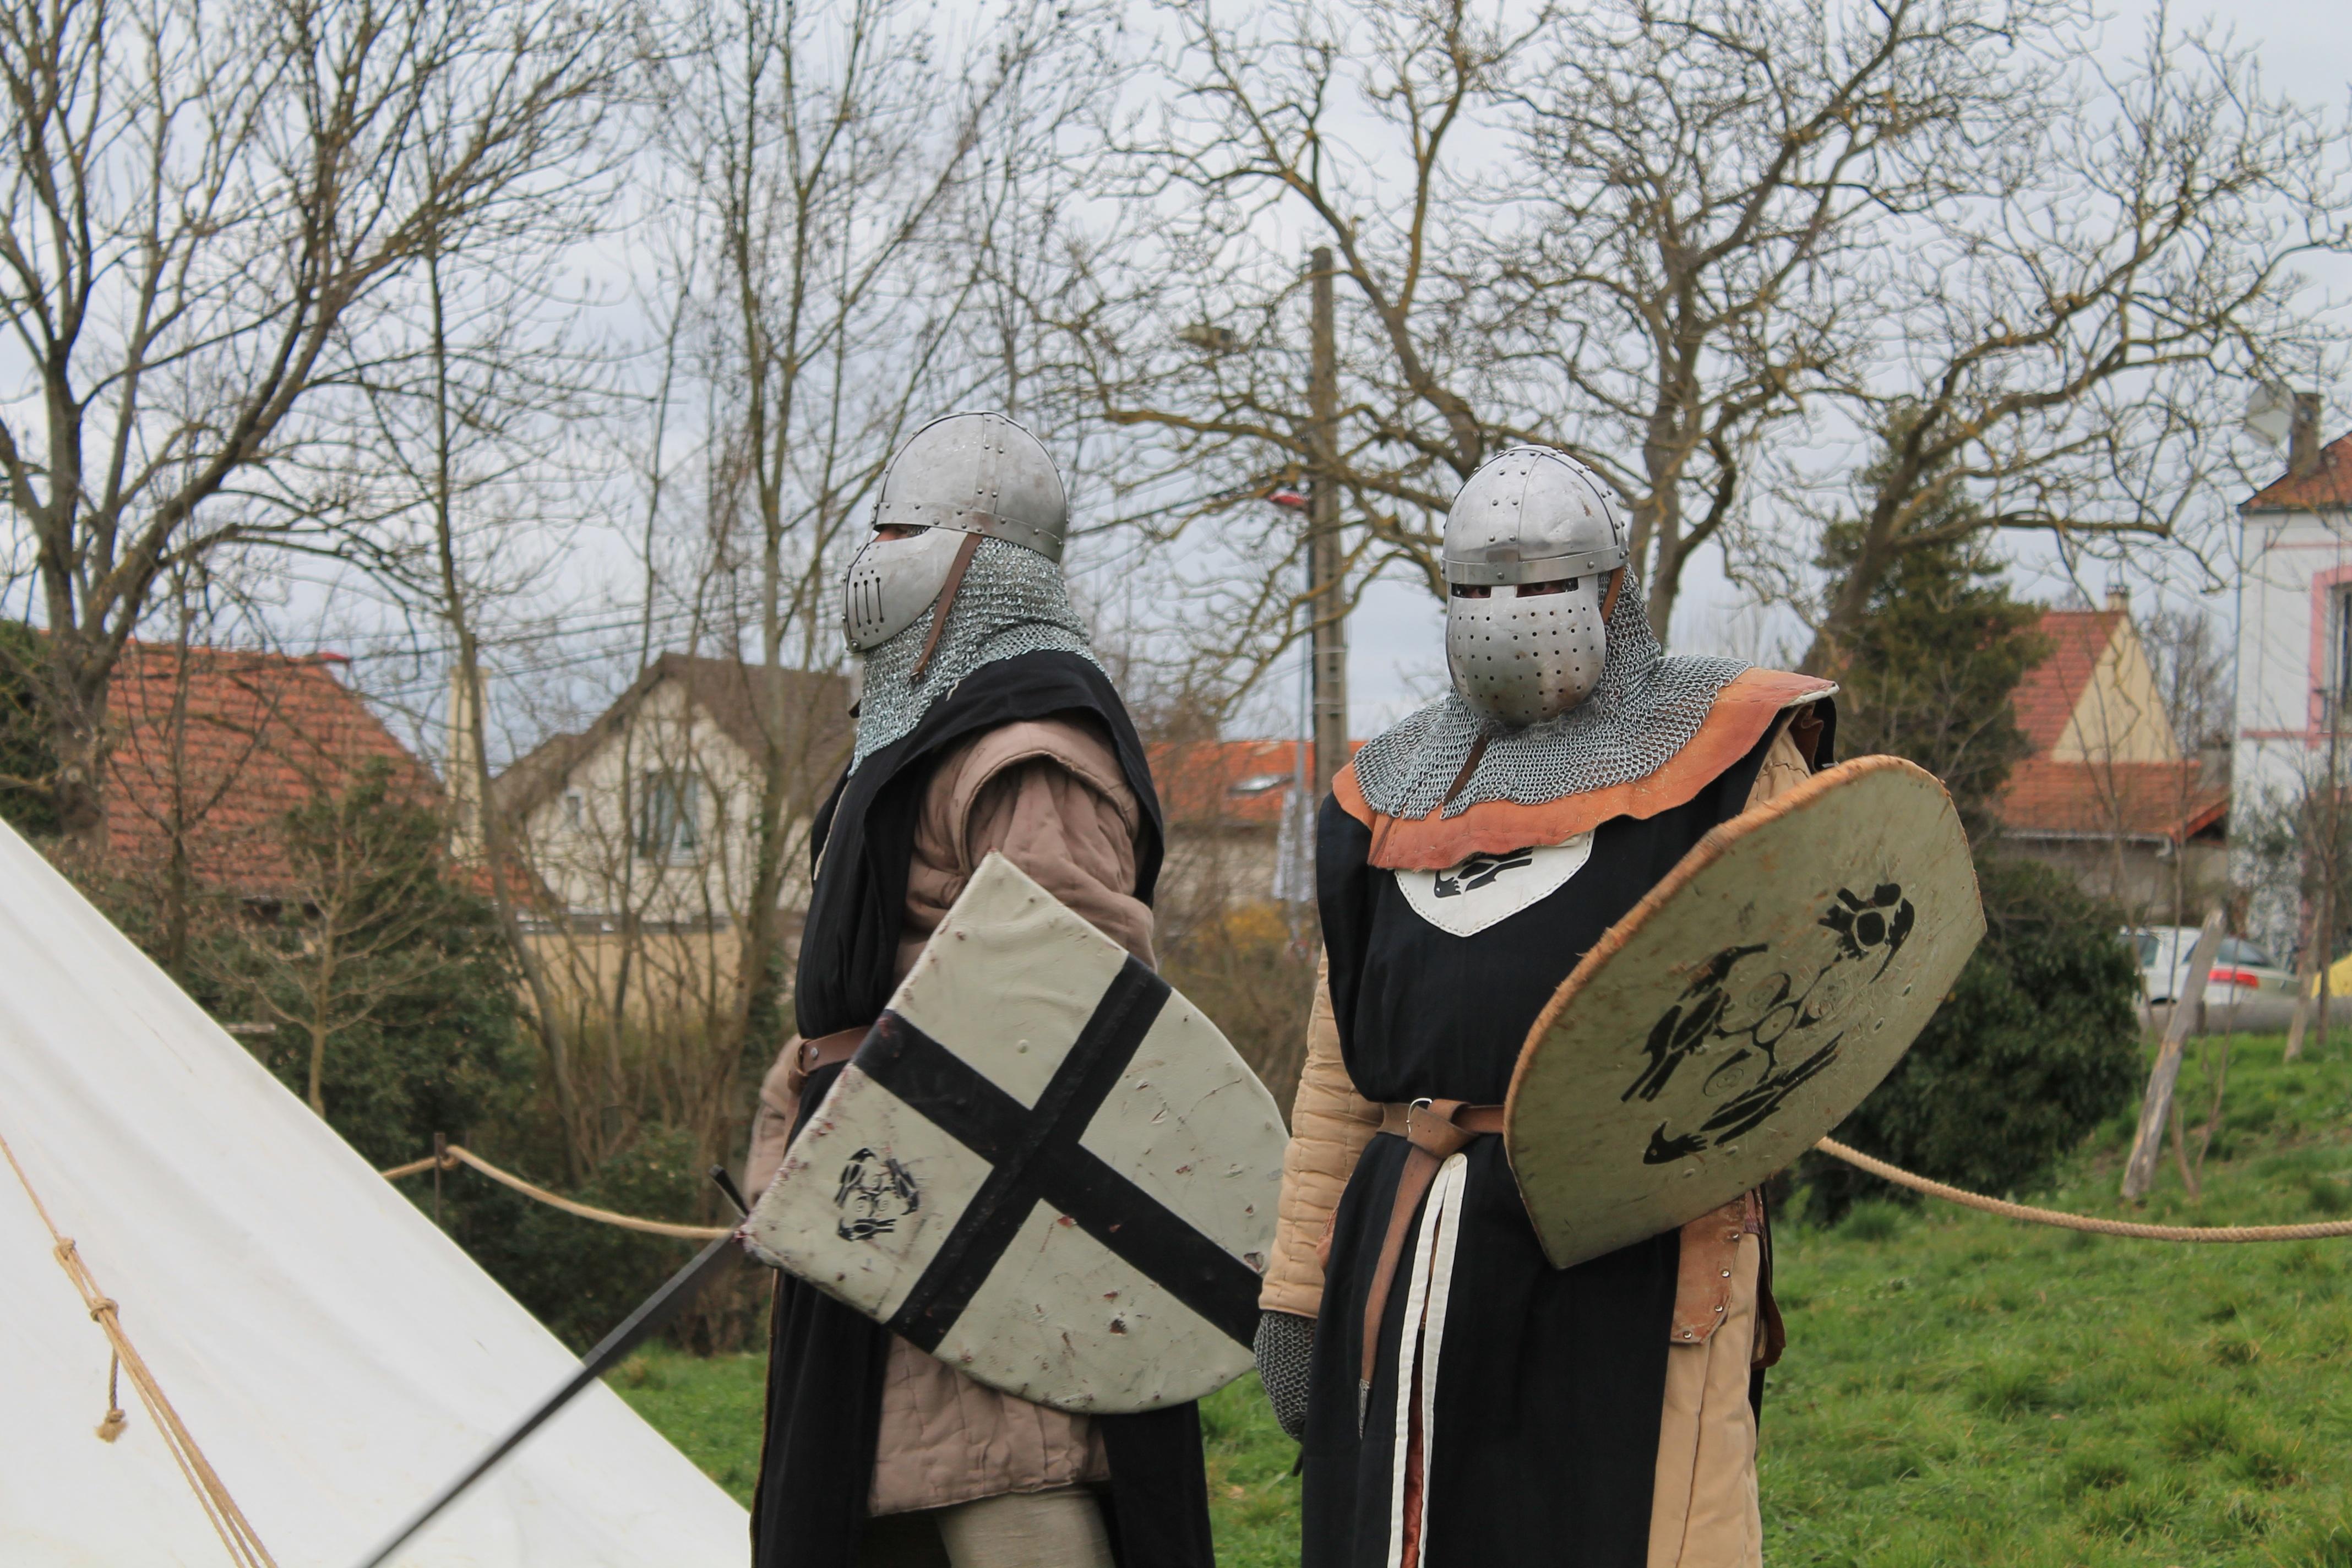 free images tree spring sword medieval art helmet knight